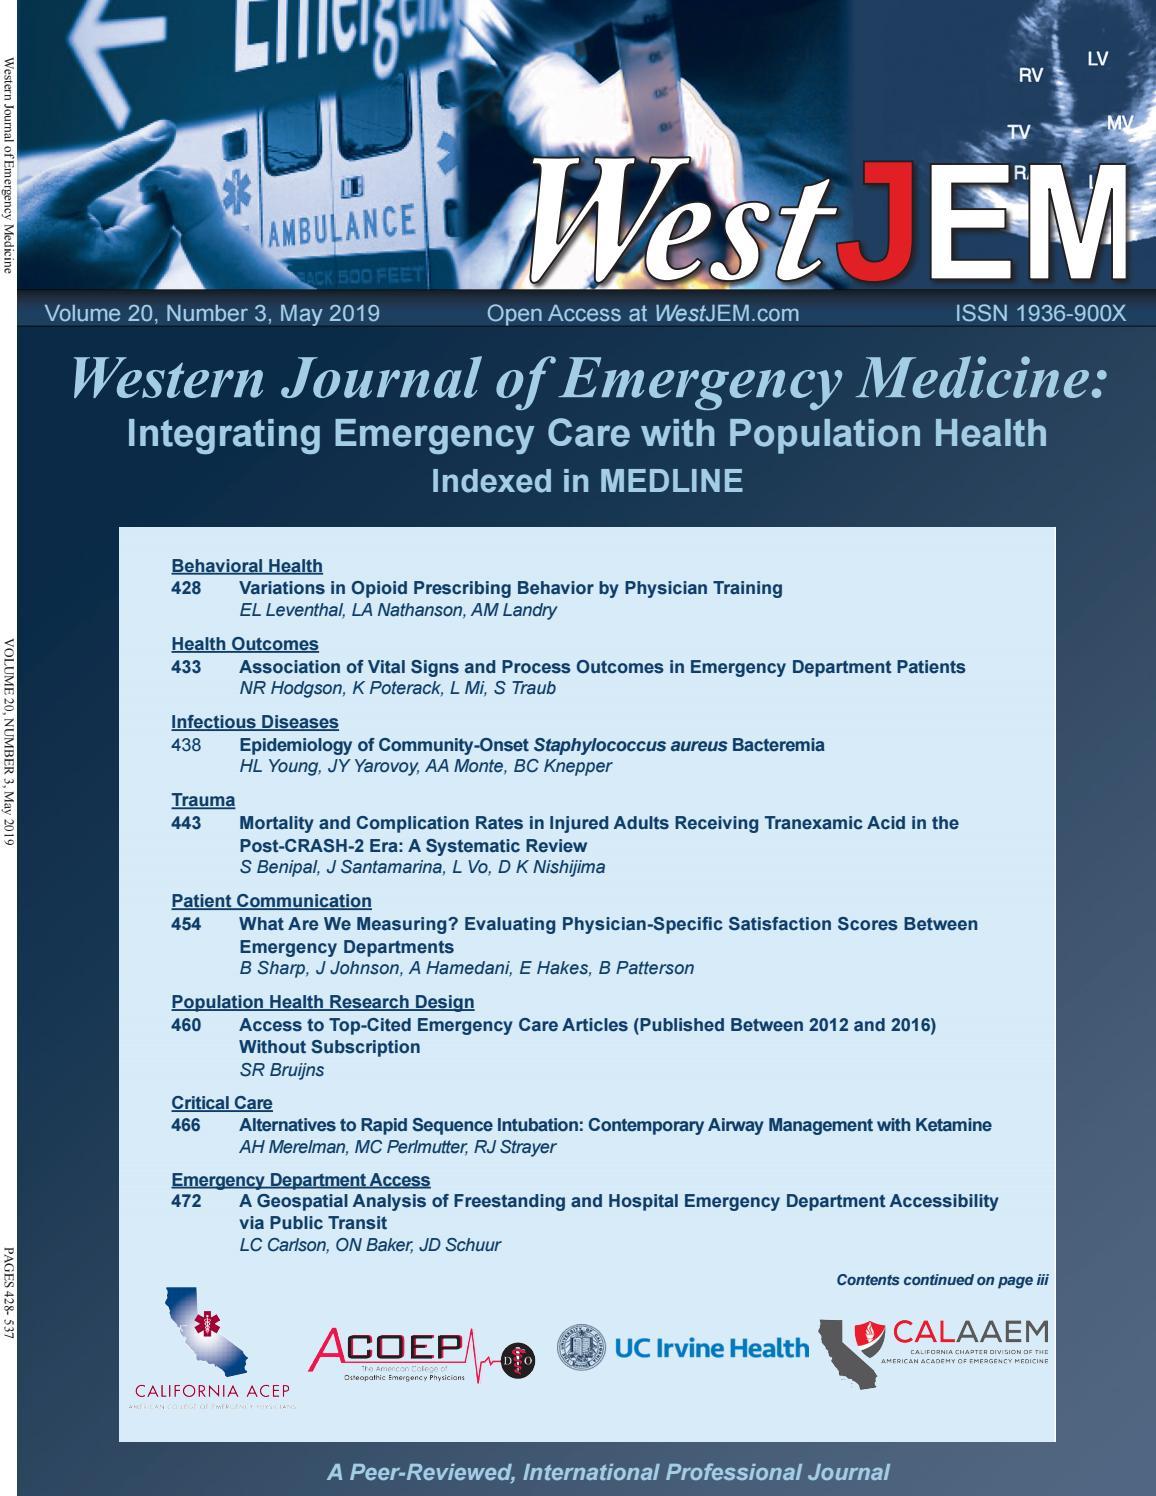 Volume 20 Issue 3 by Western Journal of Emergency Medicine